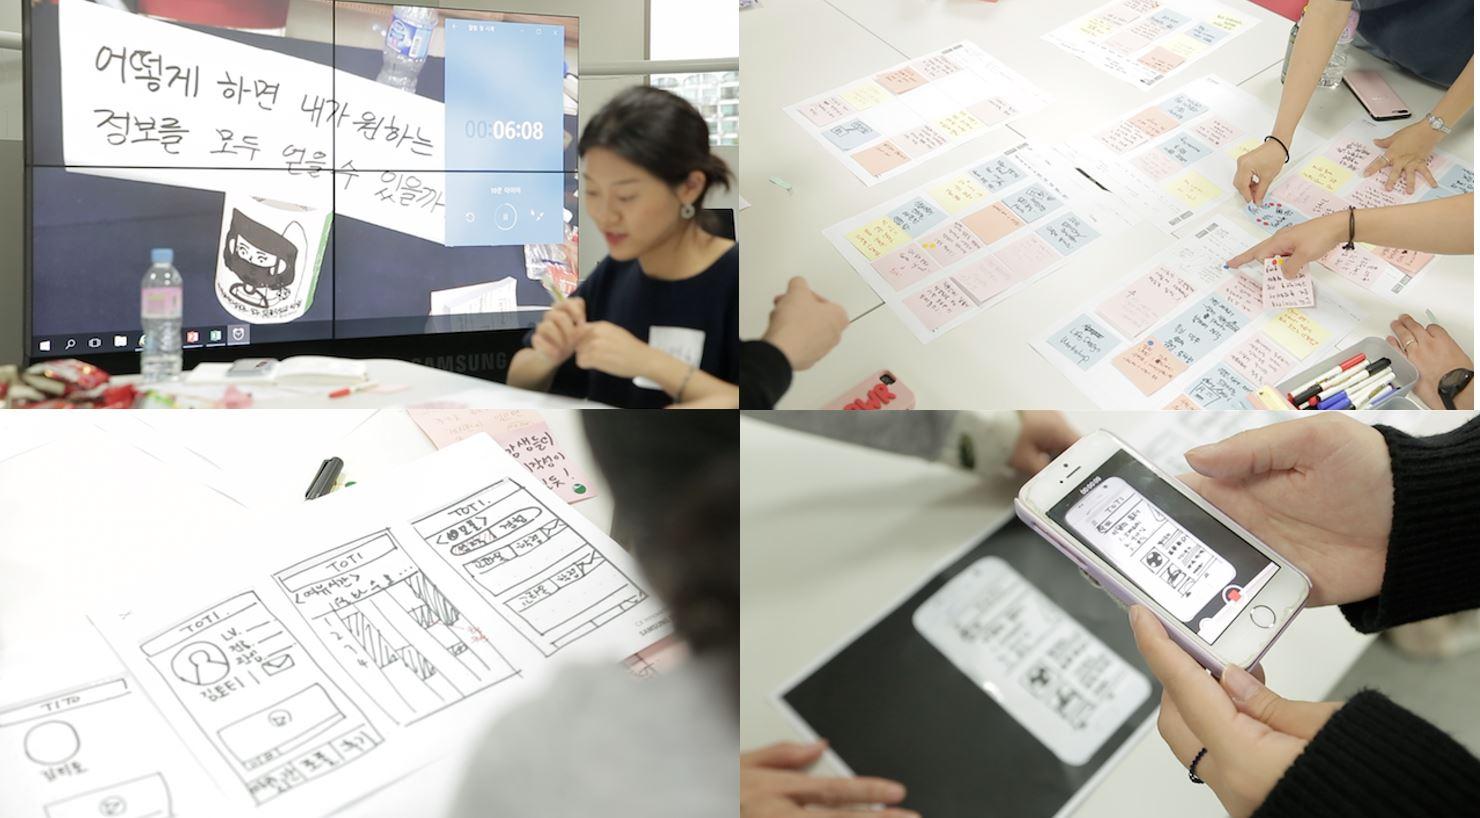 Design Thinking Workshop 참가자들이 프로토타입을 만들어가는 과정